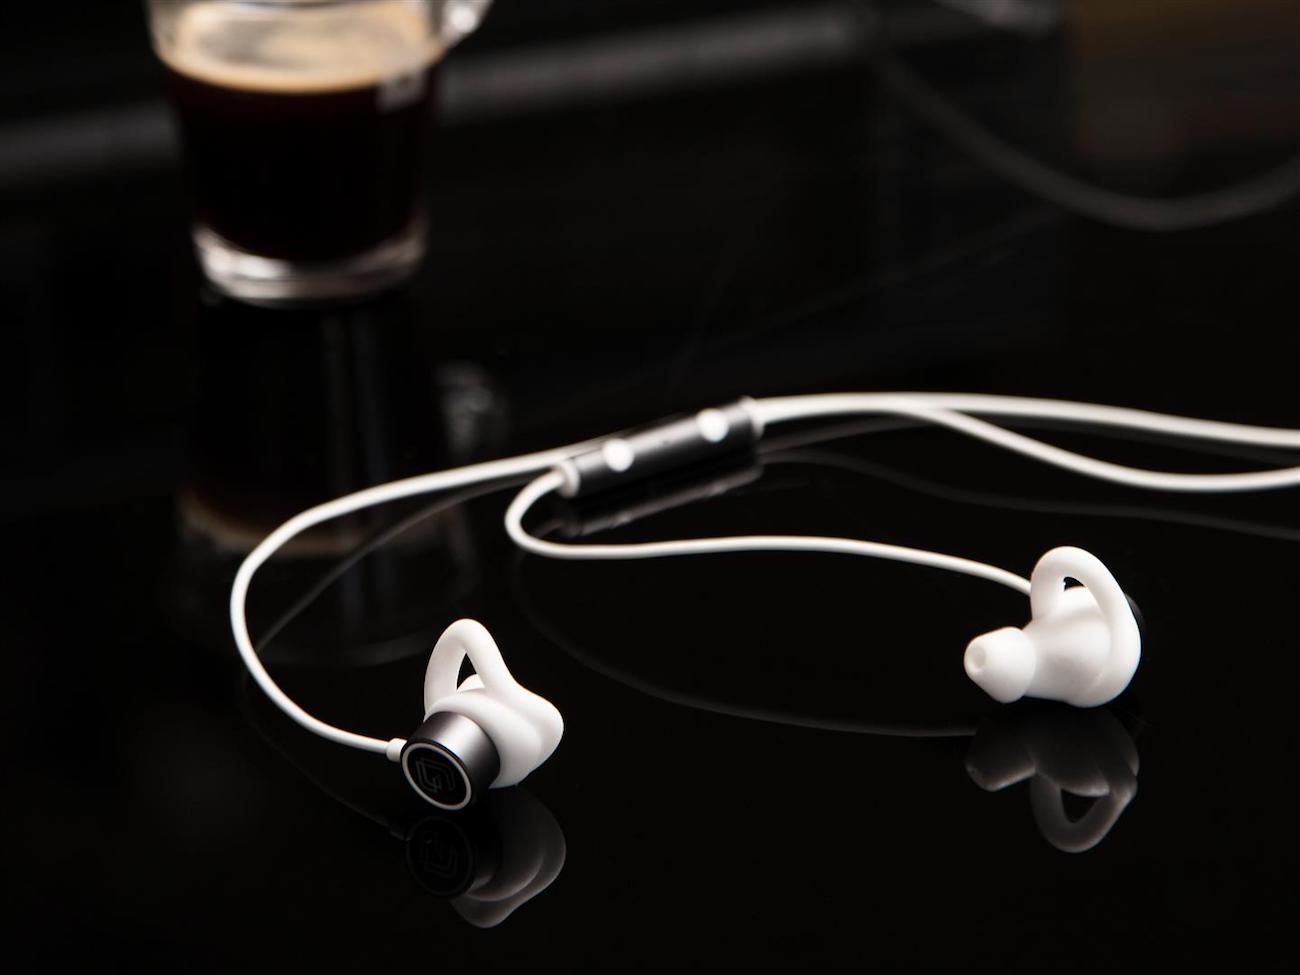 GENERICS Premium Custom-Made Wired Earphones